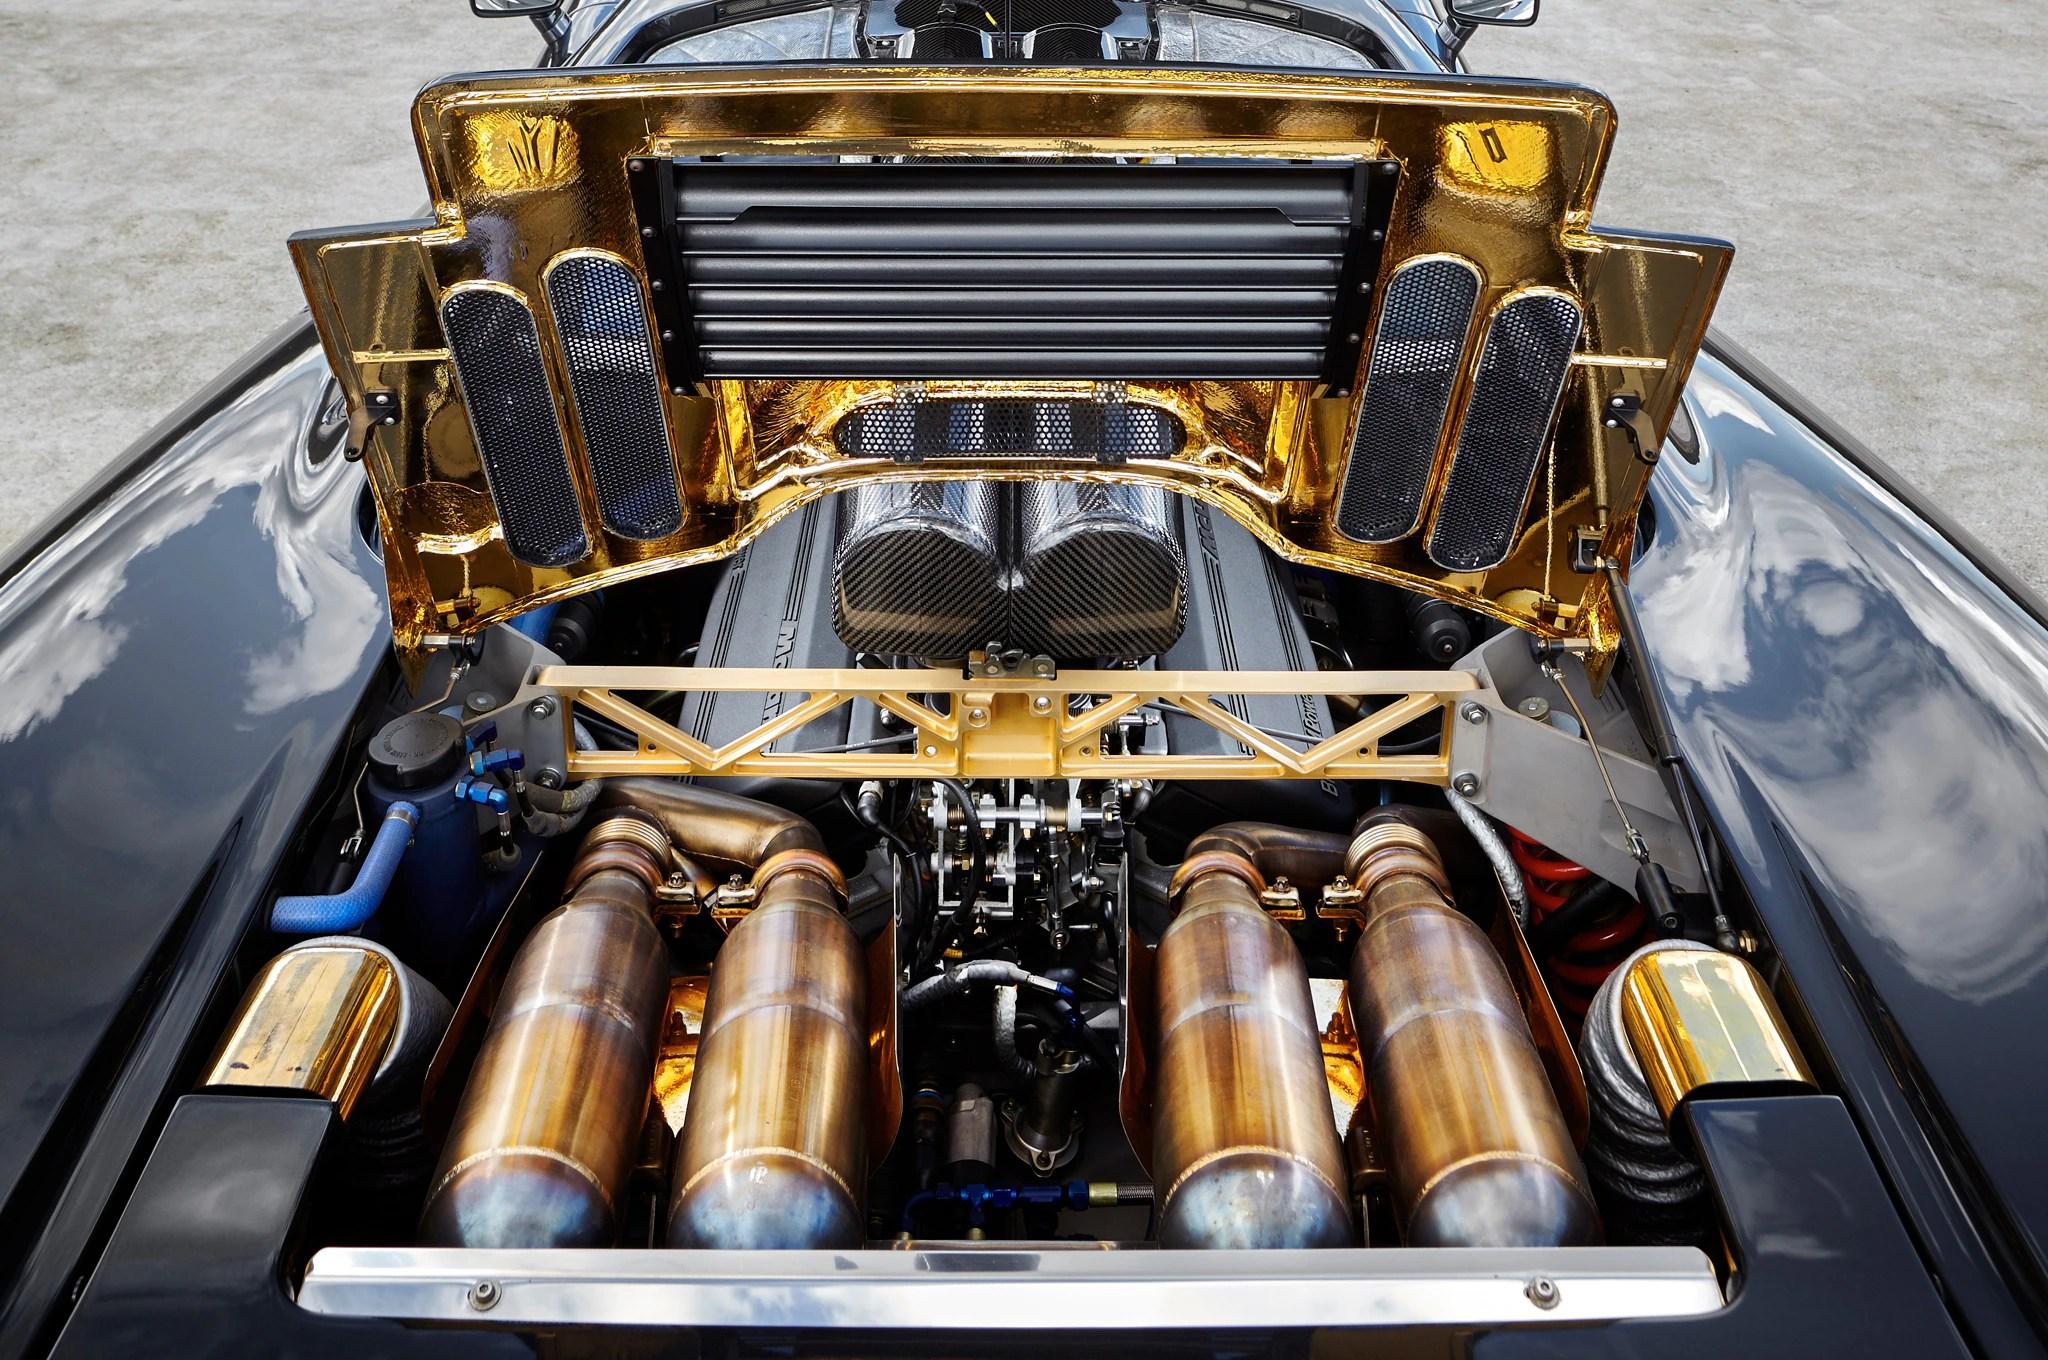 medium resolution of mclaren f1 chassis 069 engine 02